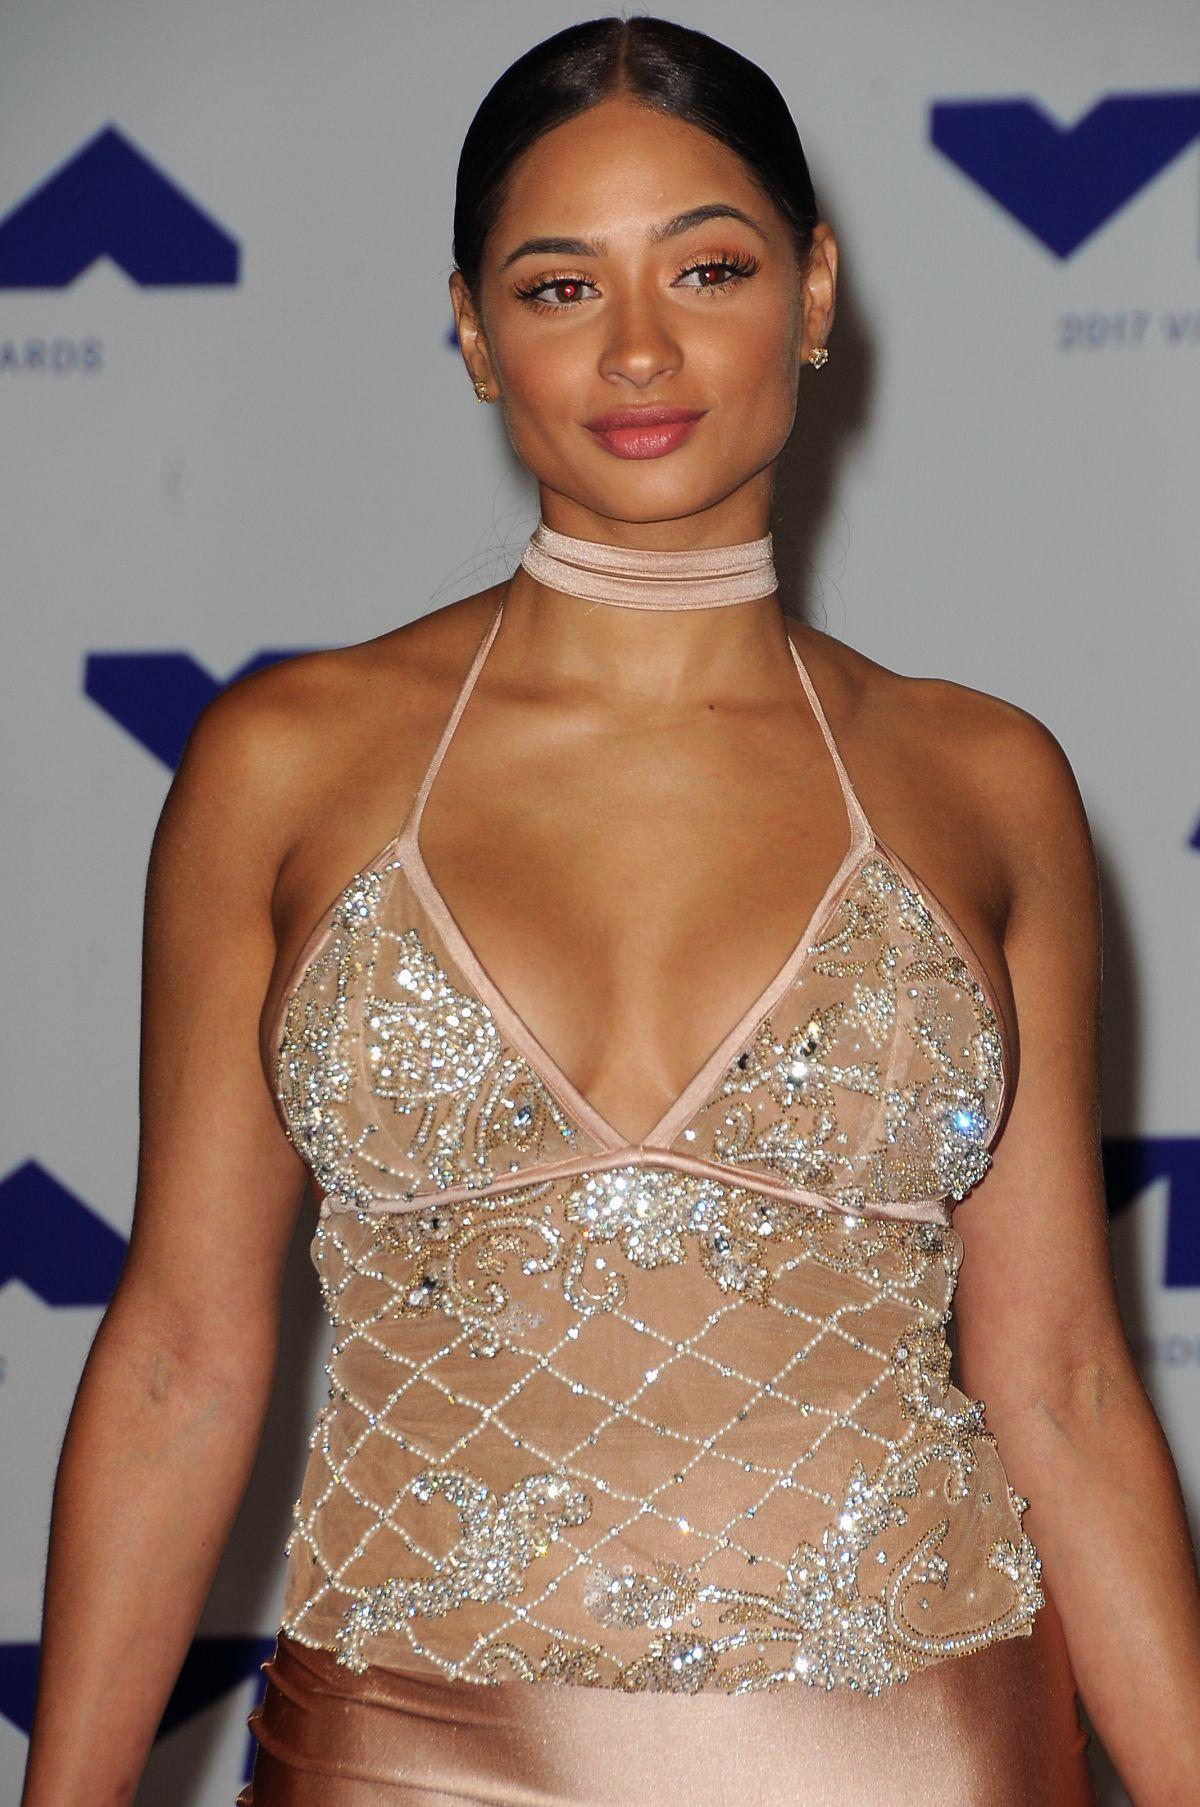 TORI BRIXX at 2017 MTV Video Music Awards in Los Angeles 08/27/2017